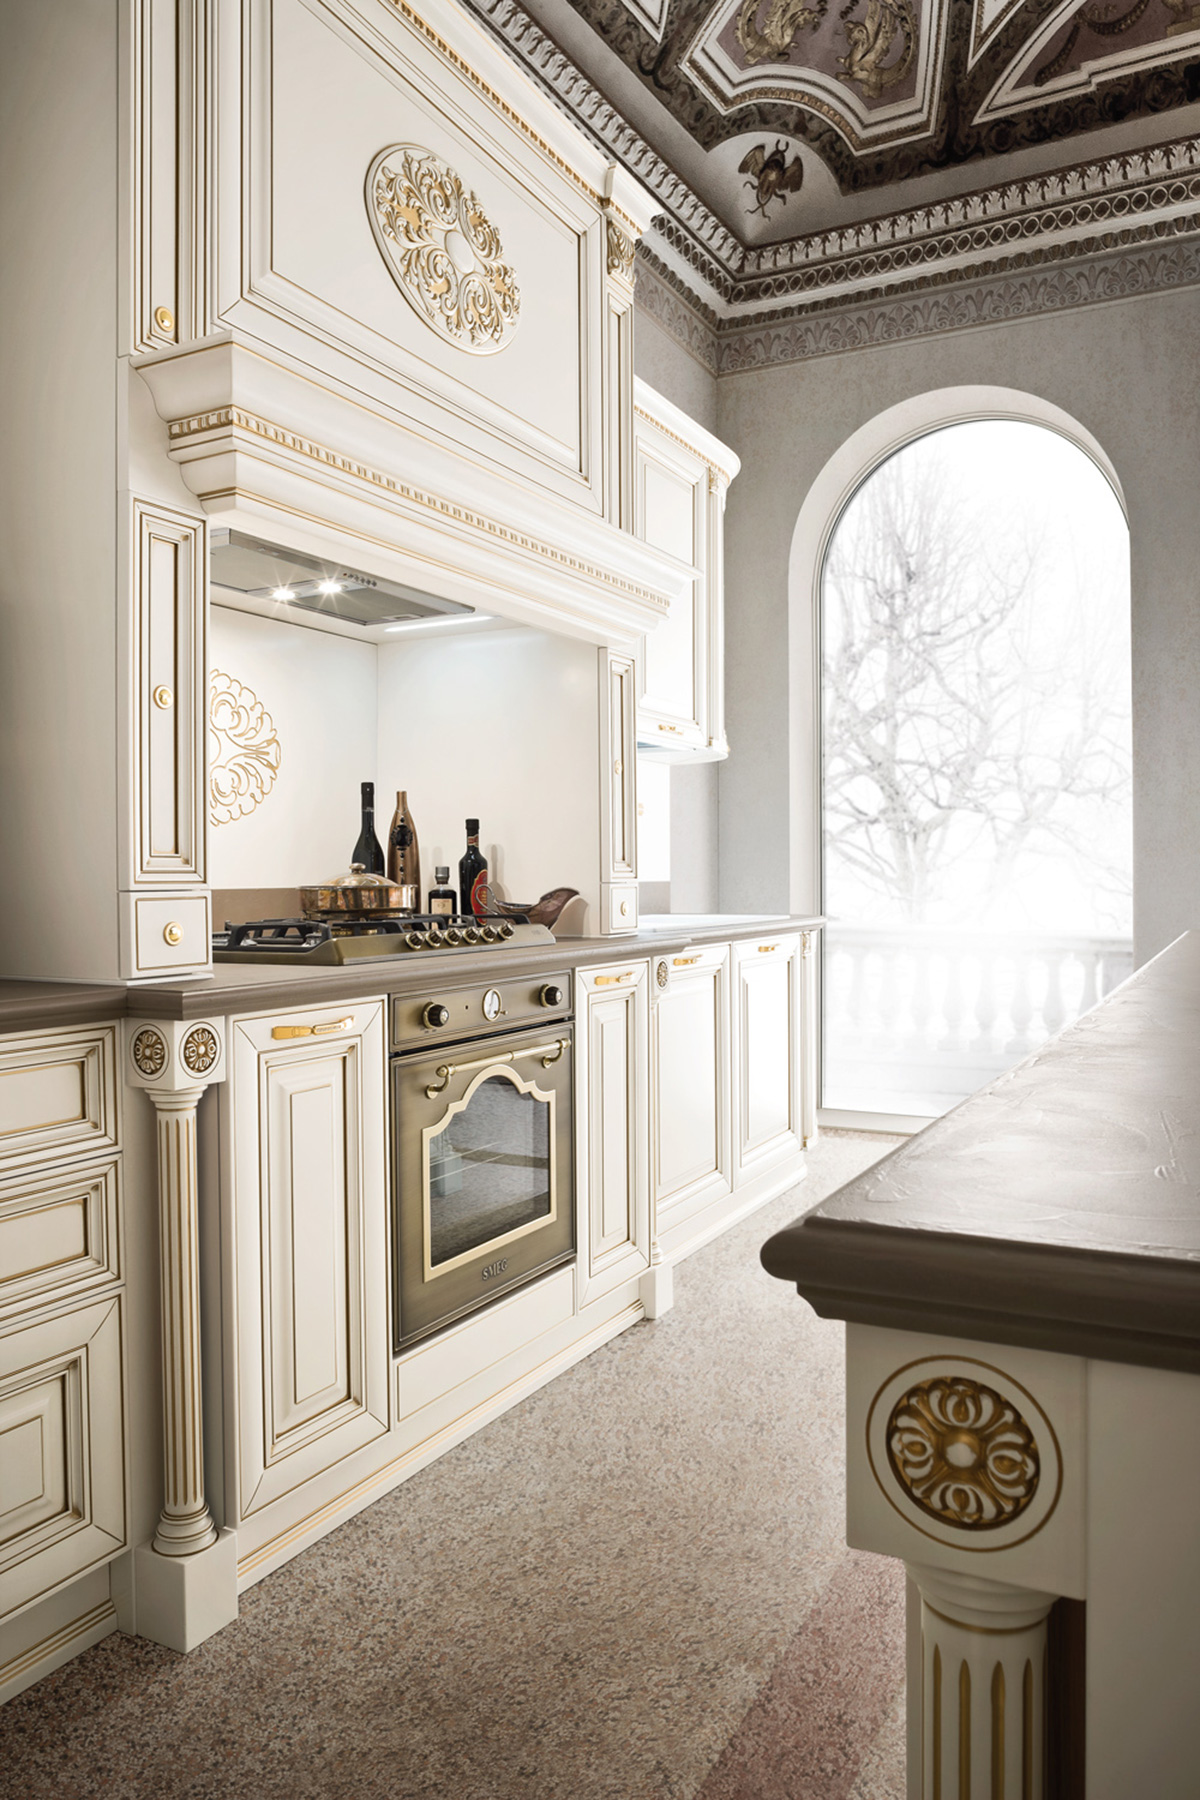 Best Aerre Cucine Opinioni Images - Home Design - joygree.info